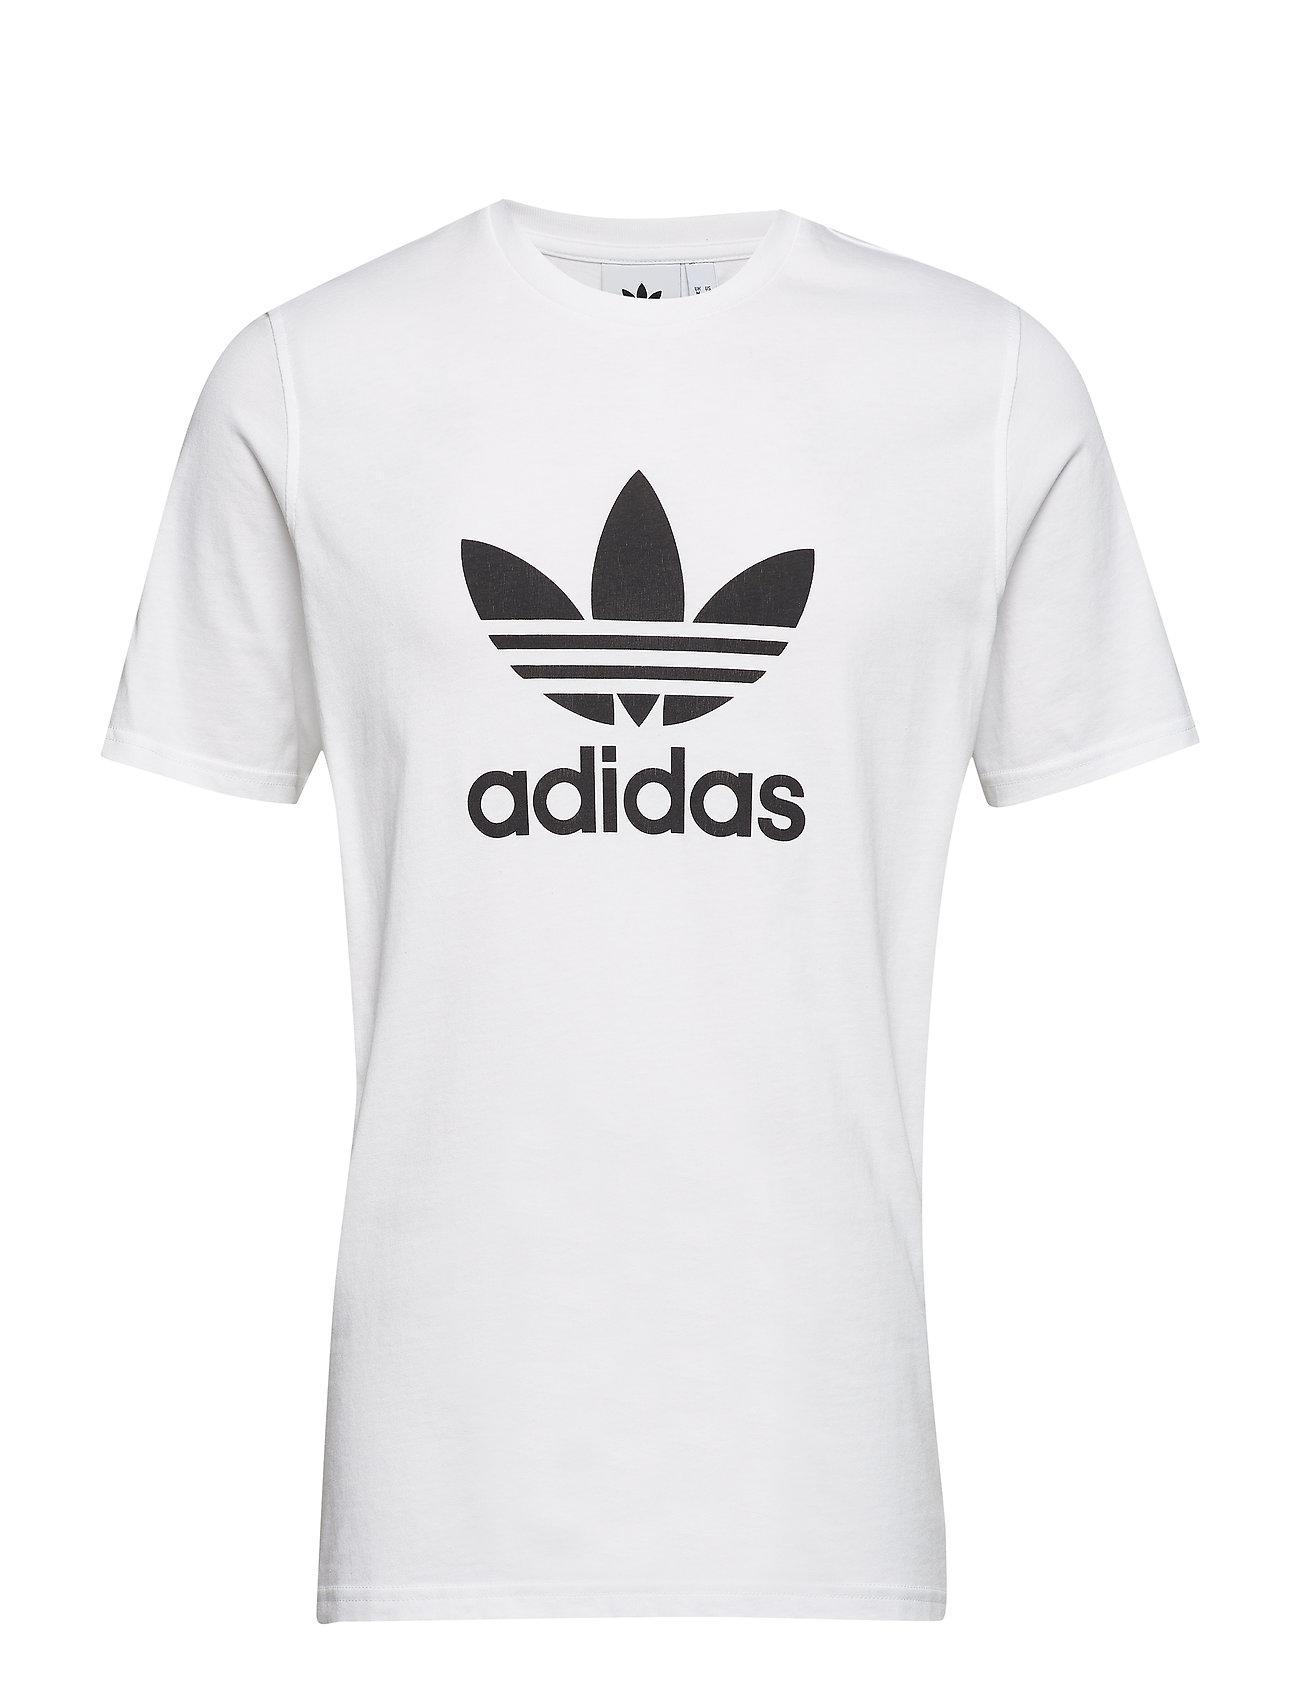 adidas Originals TREFOIL T-SHIRT - WHITE